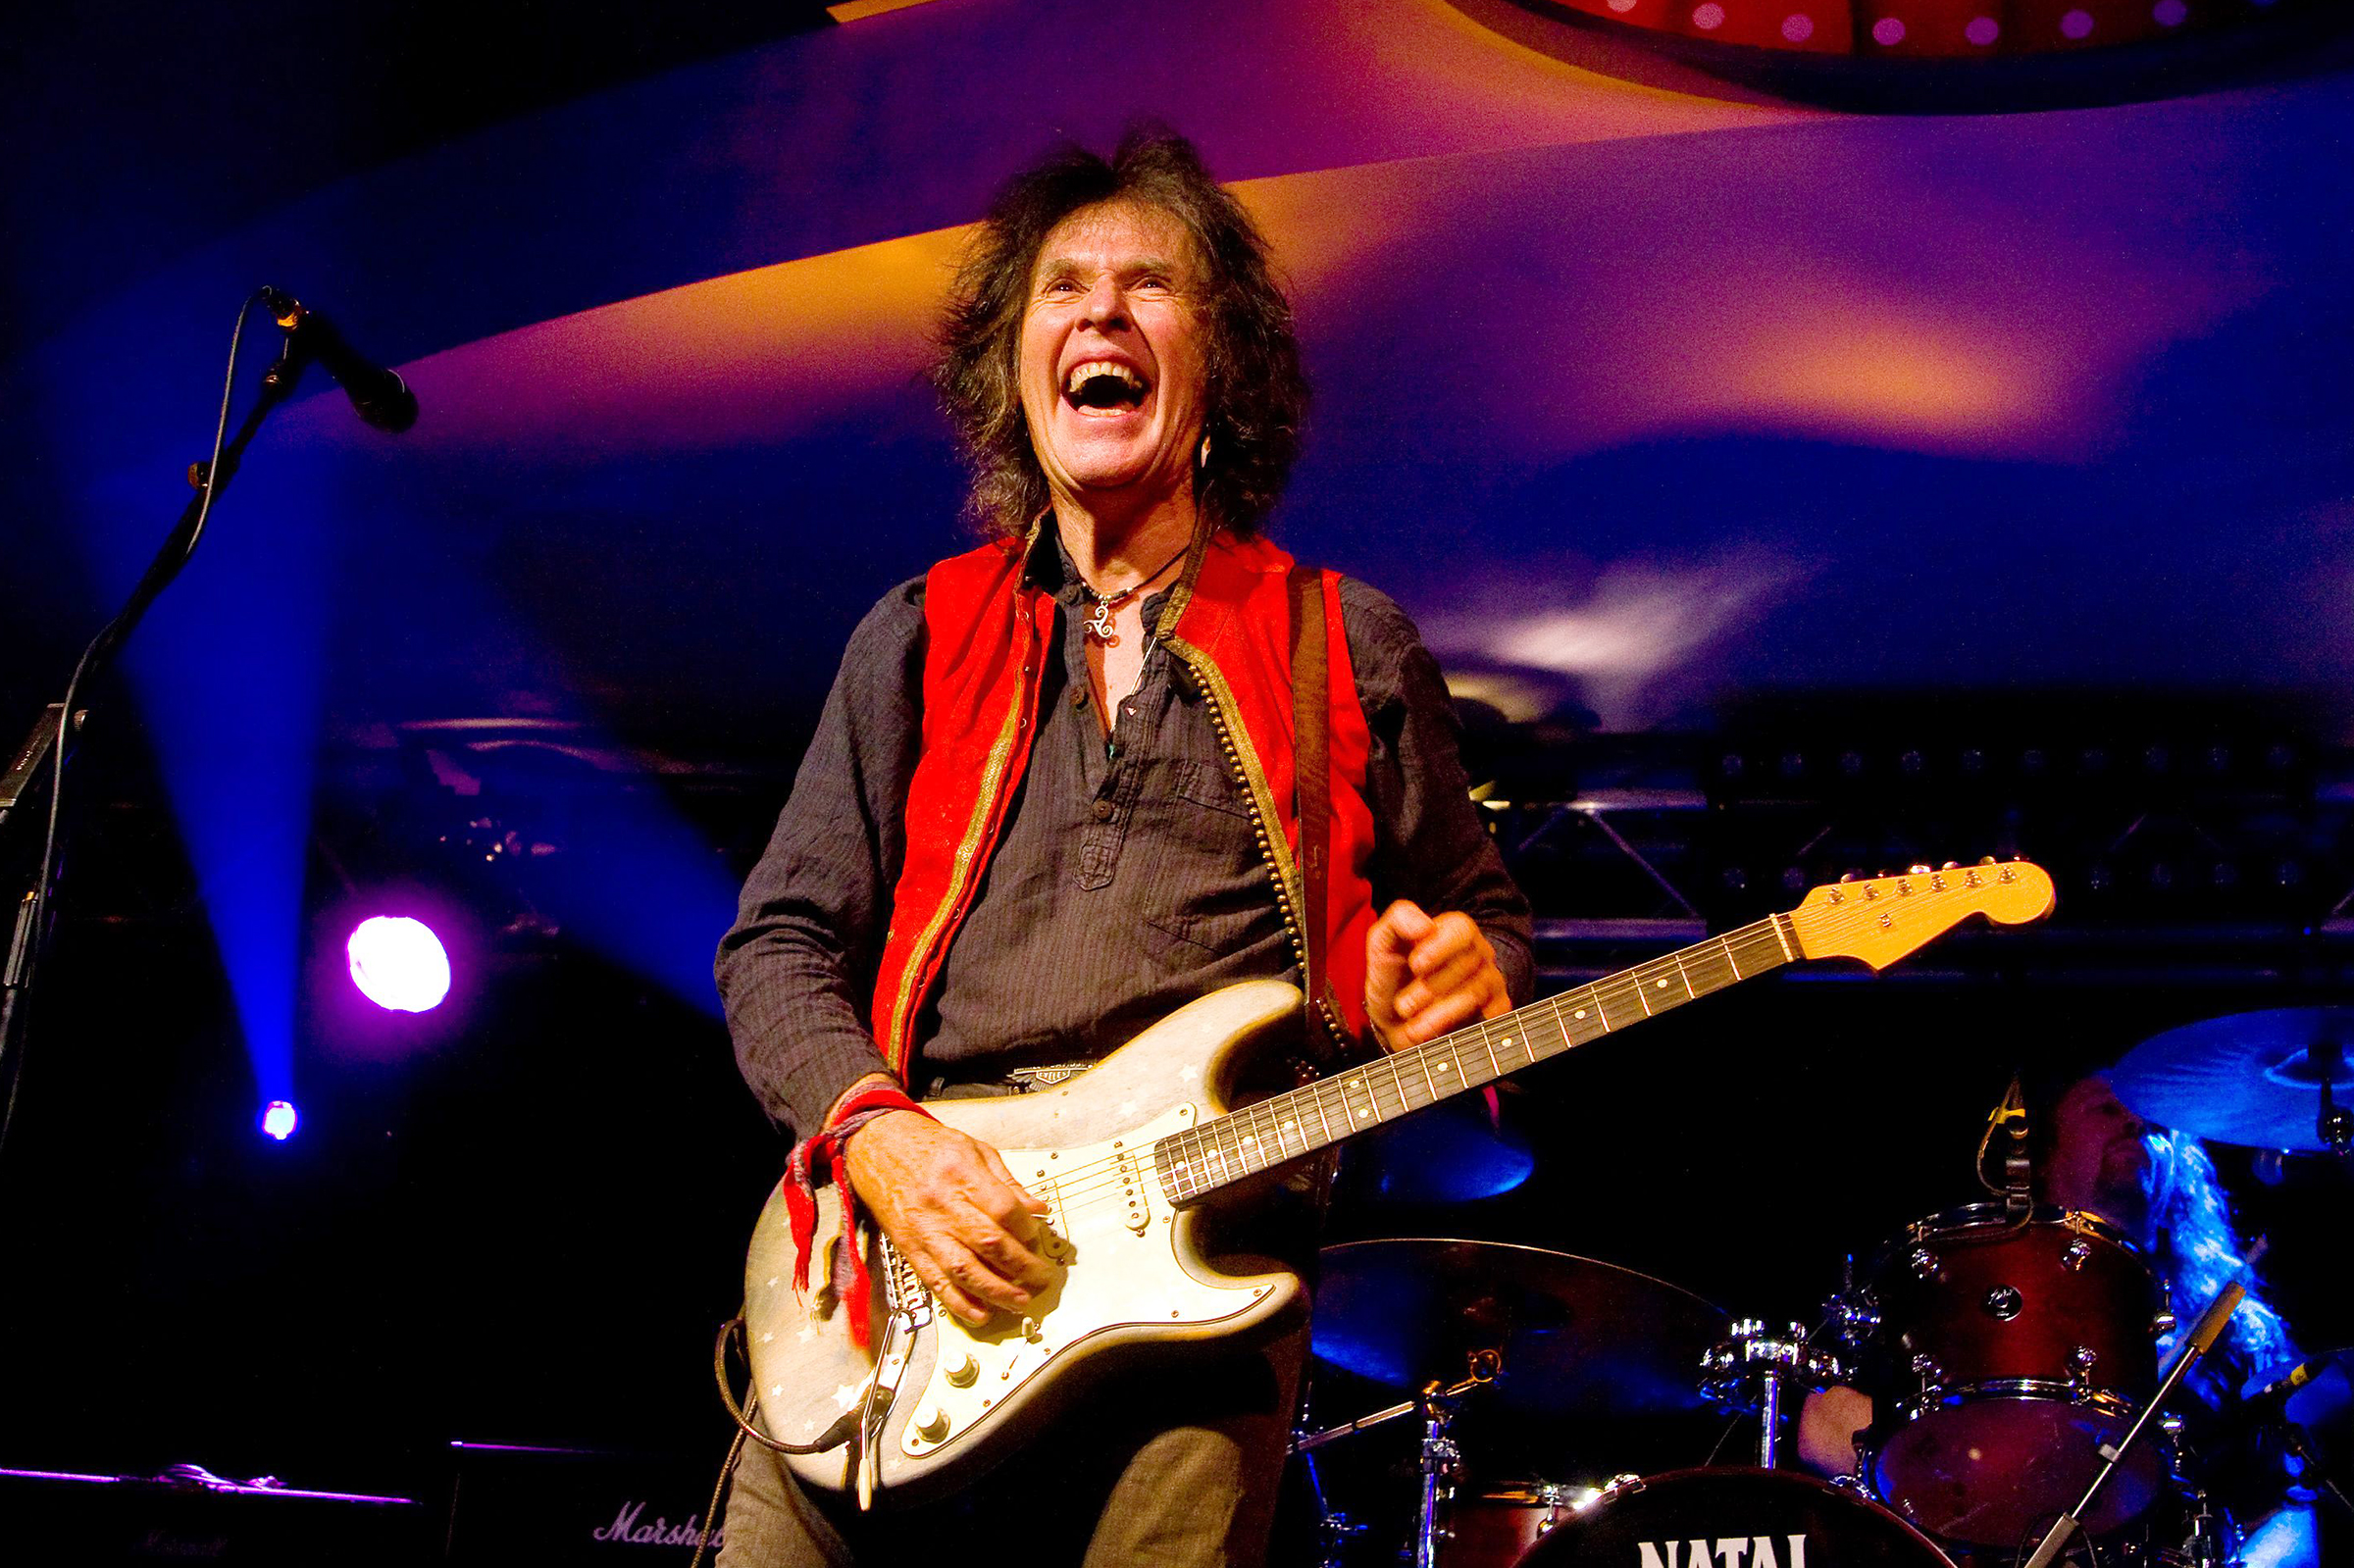 IMG BERNIE TORME, Irish Rock Guitarist, Singer, Songwriter